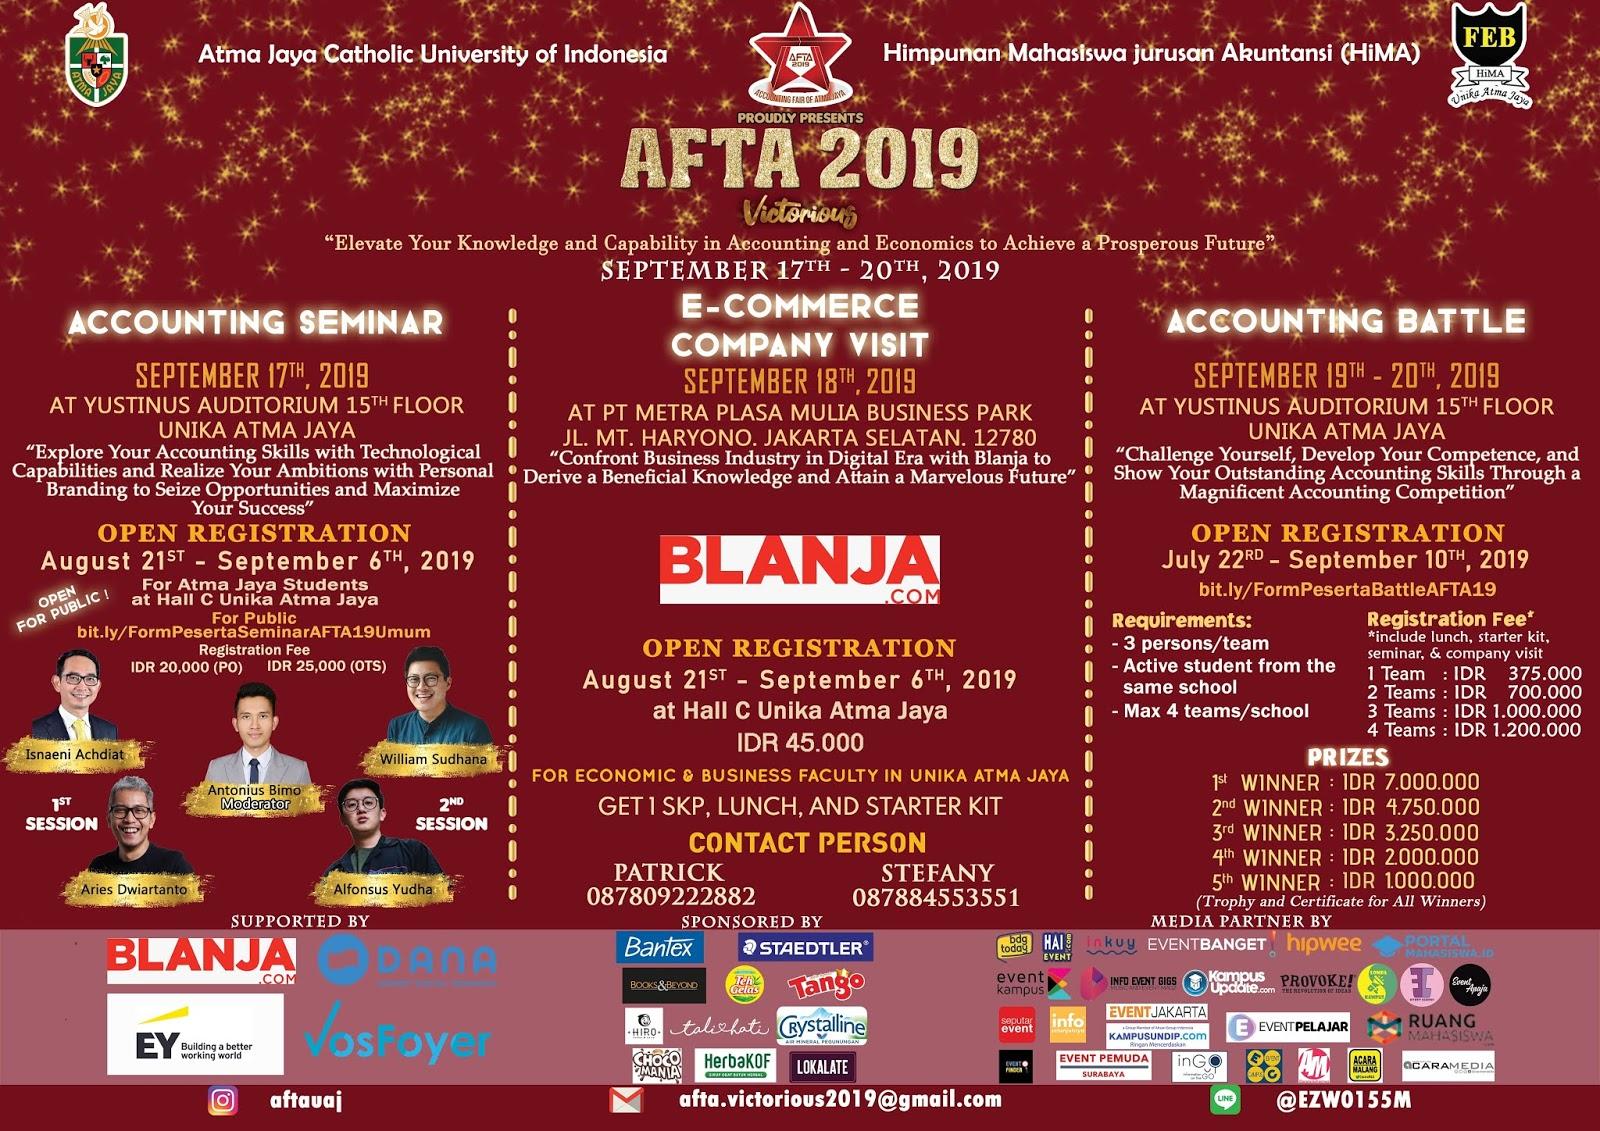 Universitas Atma Jaya - AFTA 2019